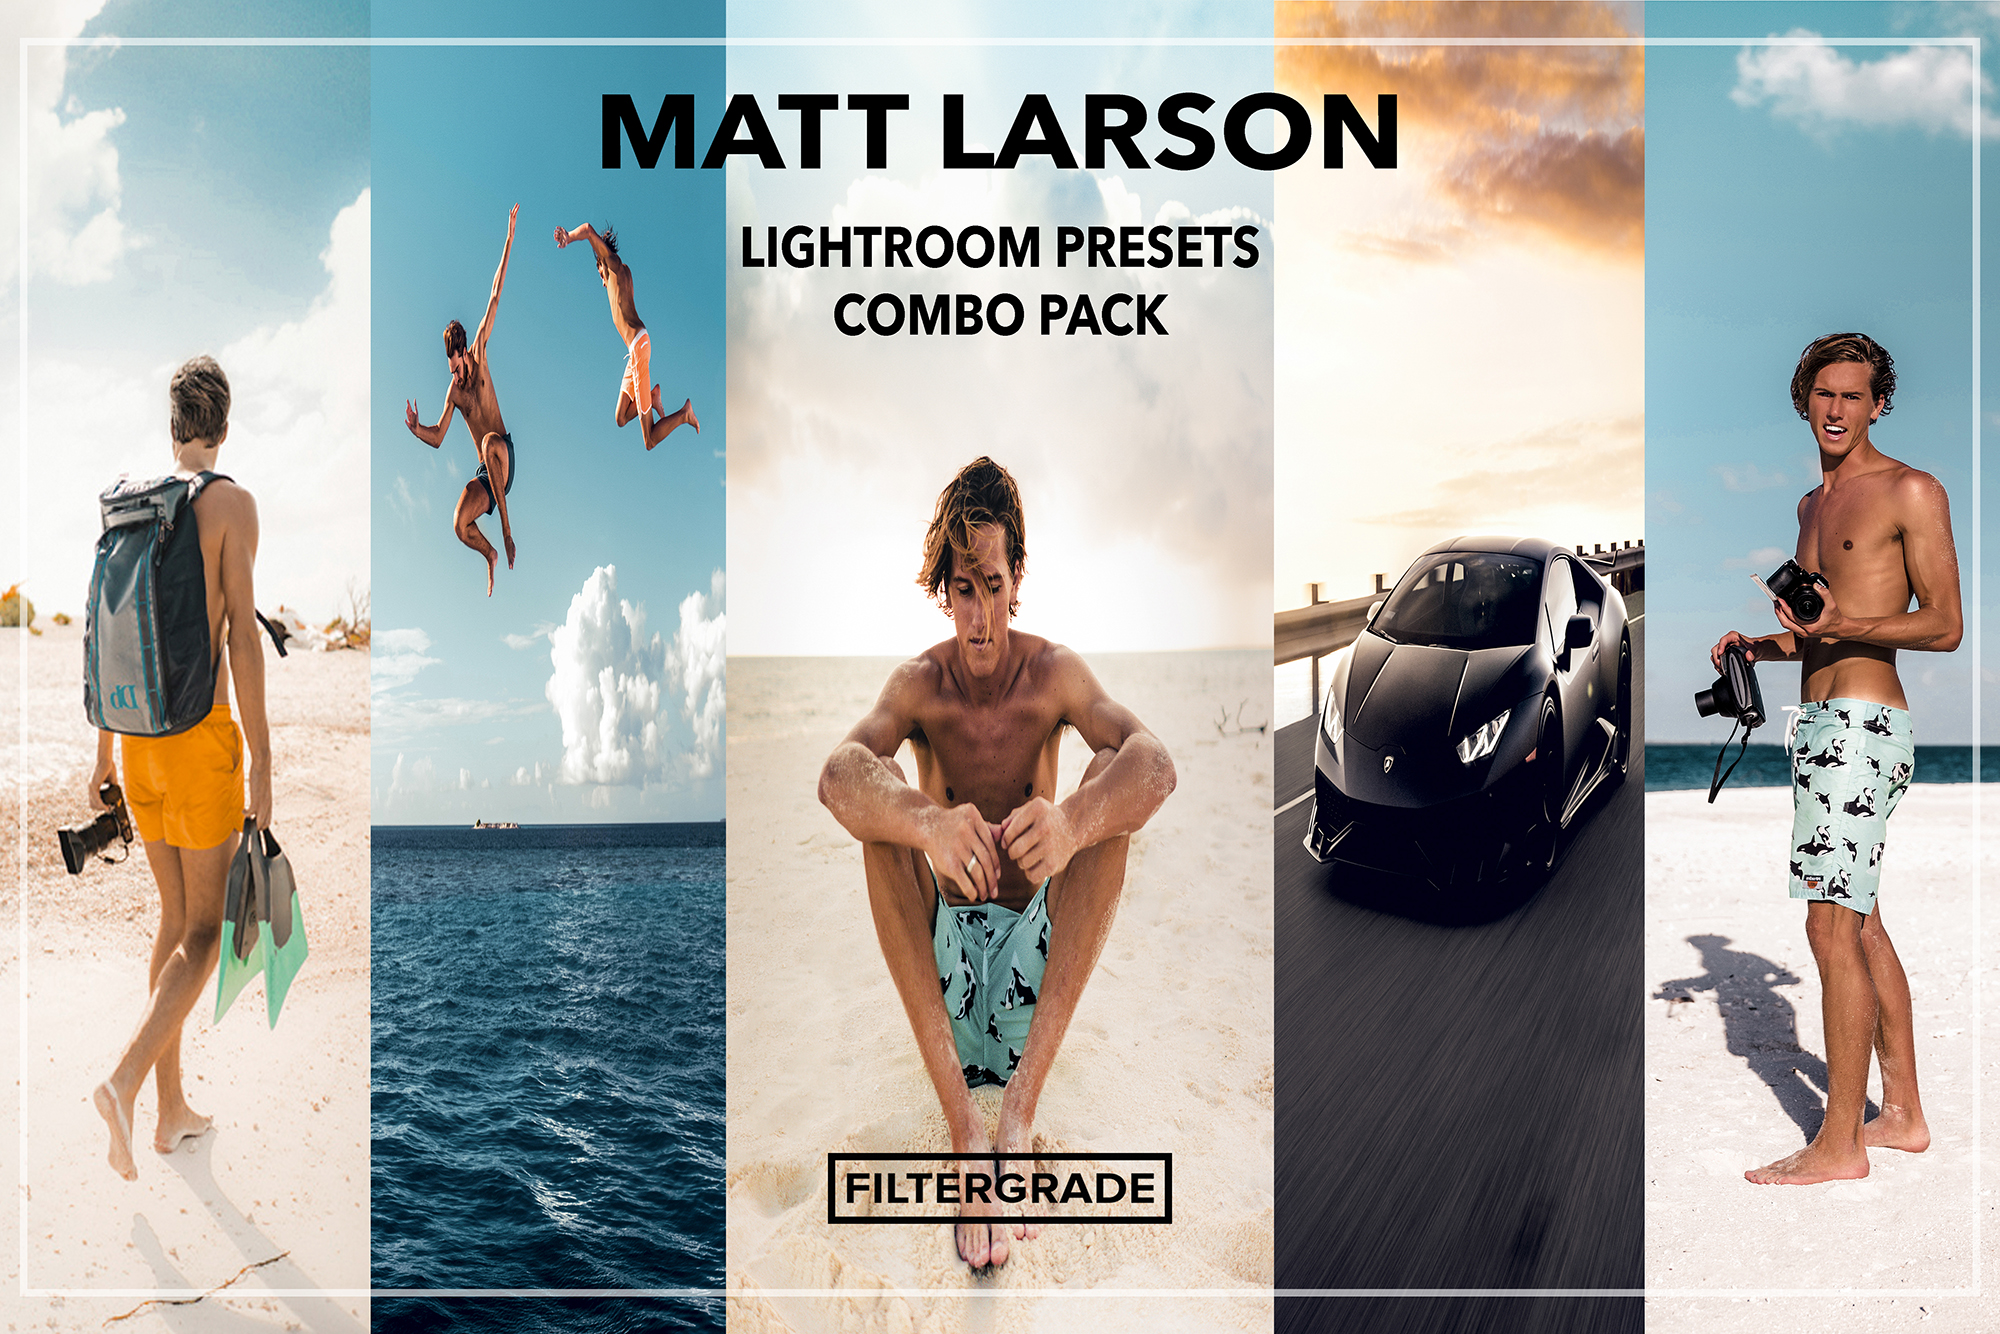 Matt Larson Lightroom Presets Combo Pack